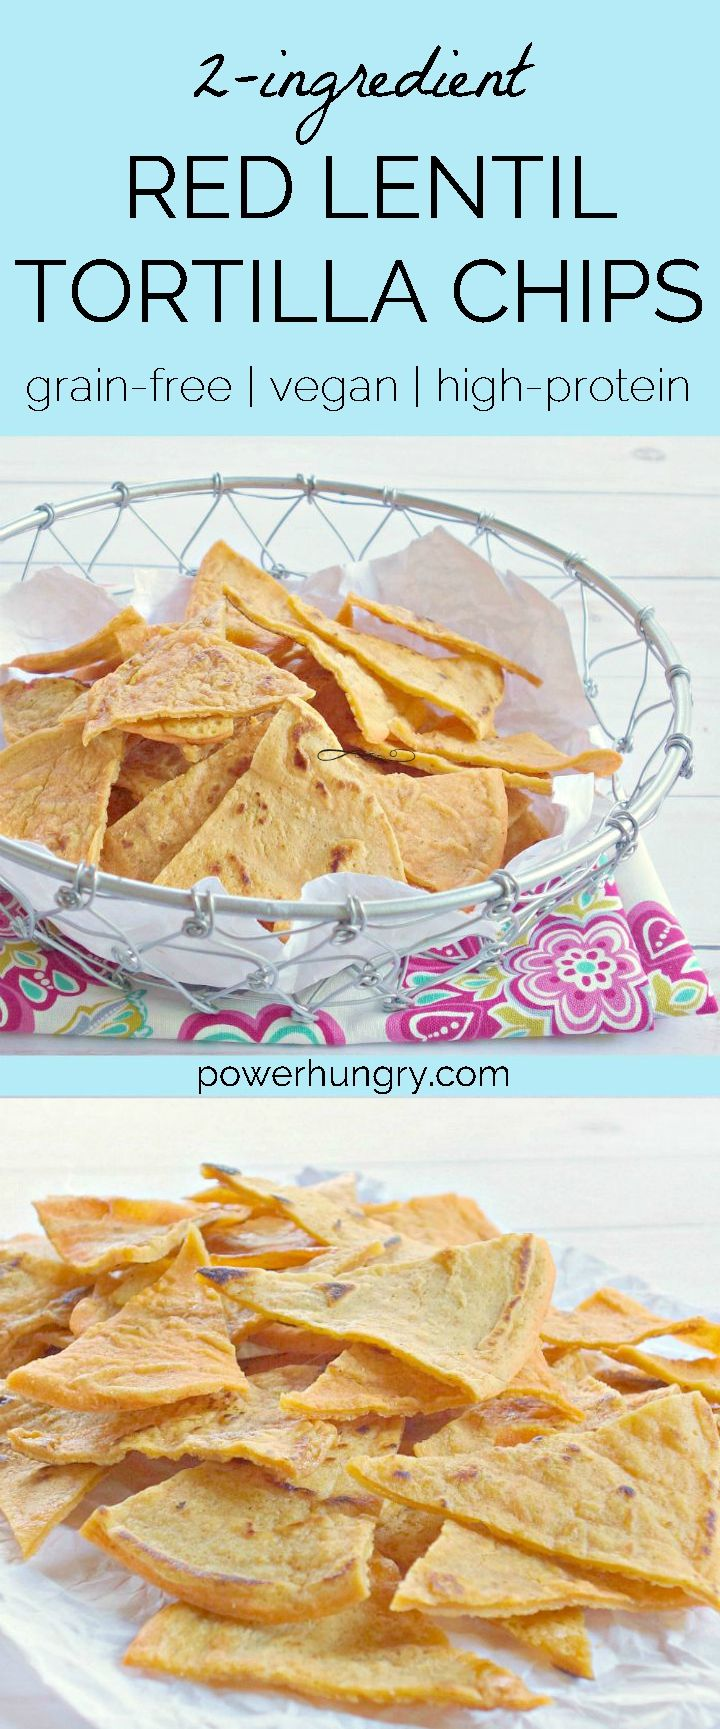 tortilla chips good for vegan diets